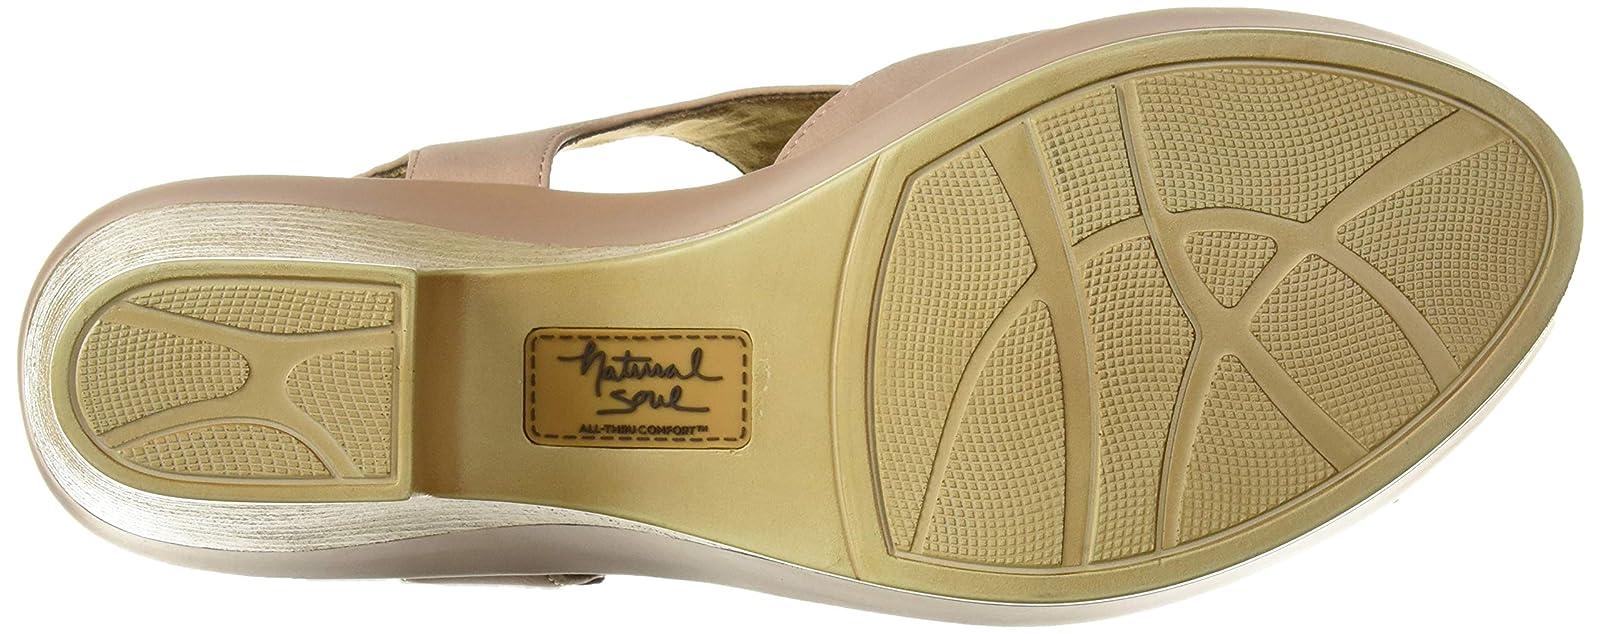 Natural Soul Women's Mia Heeled Sandal F4845S0 - 3